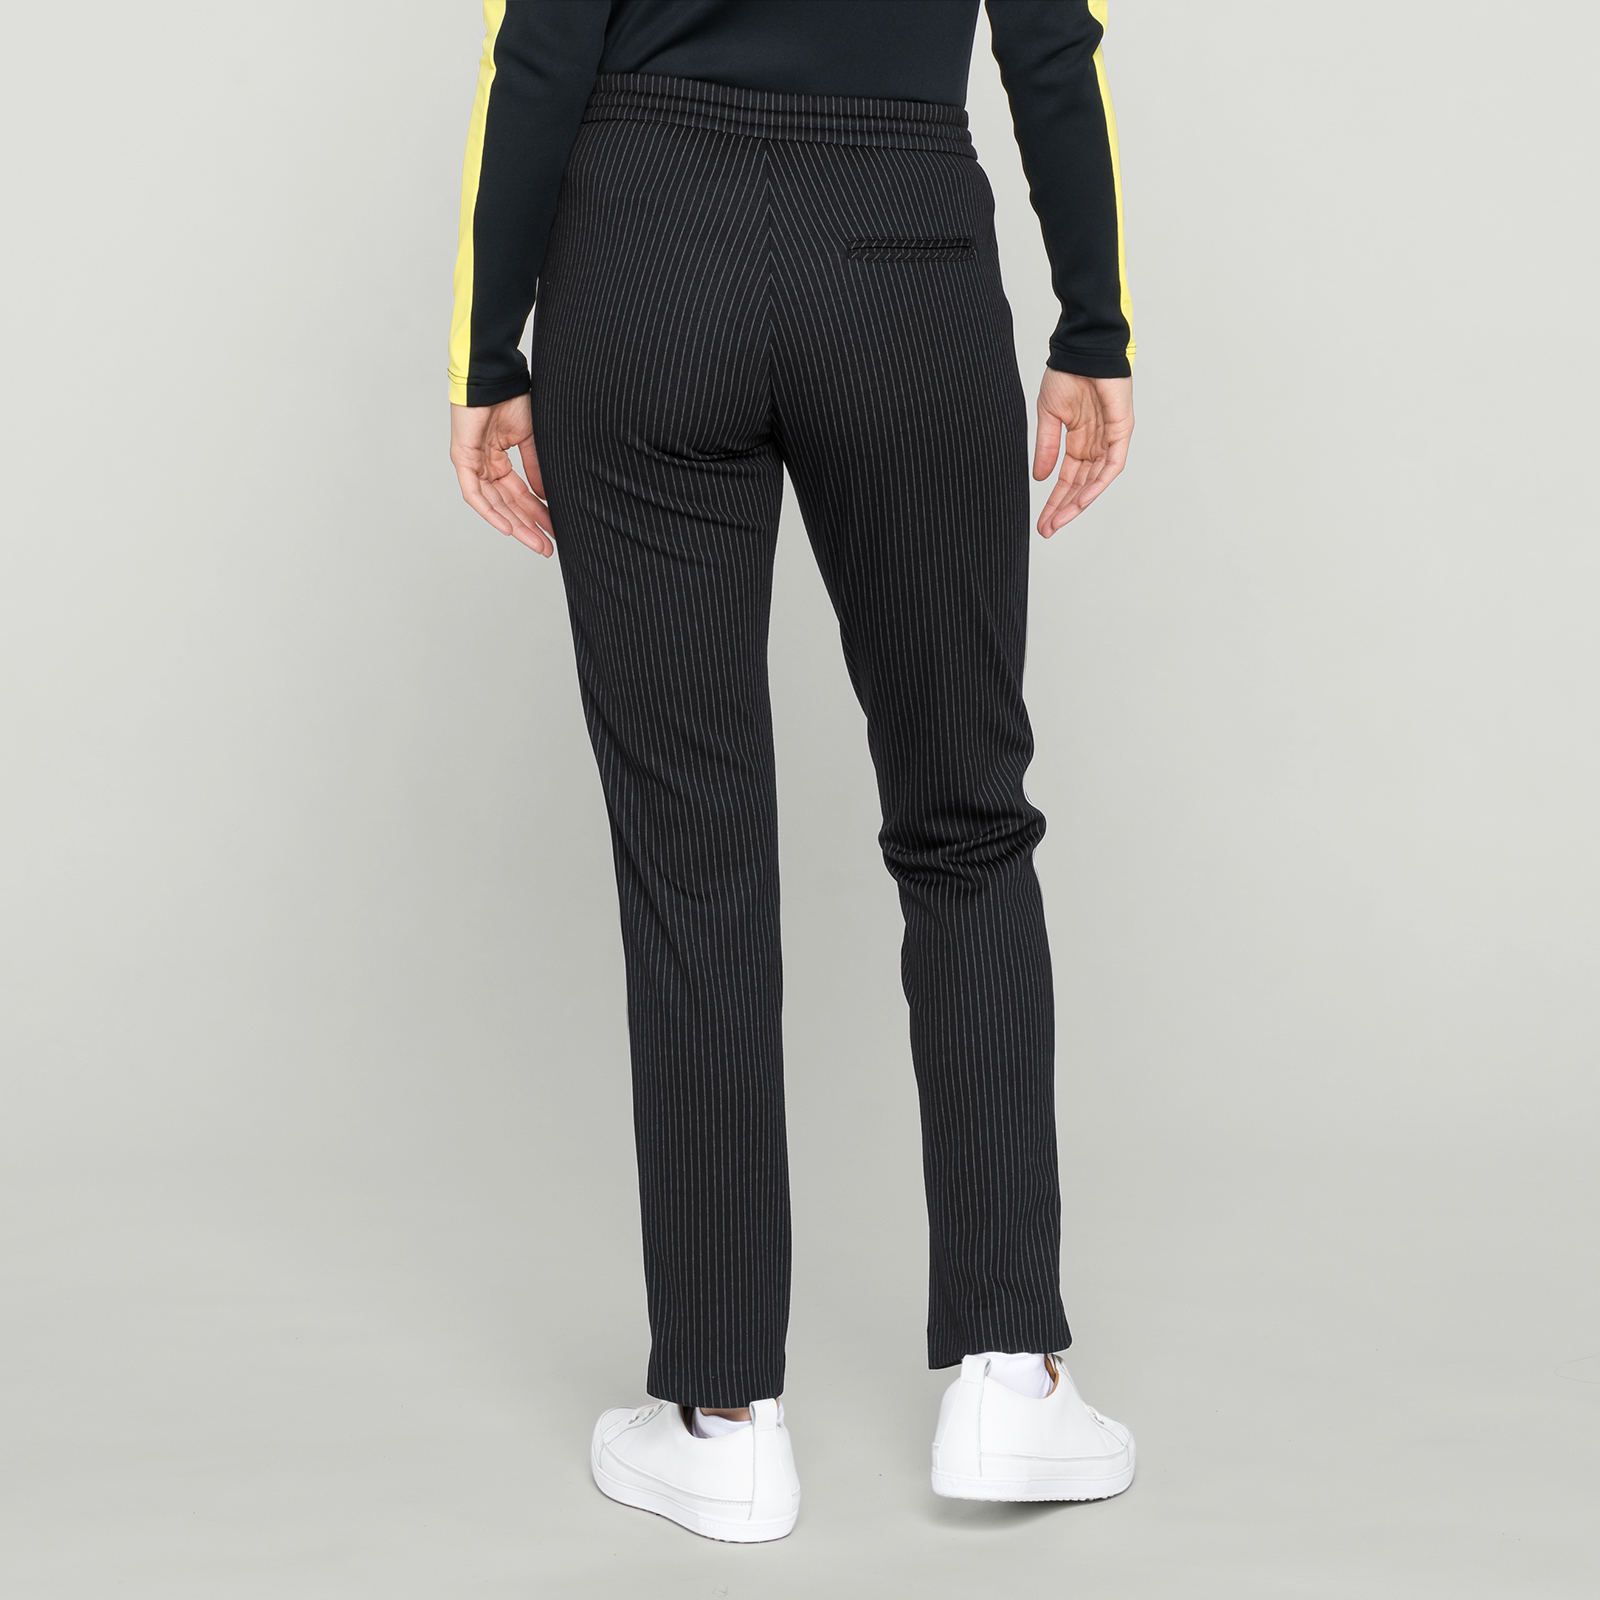 Sportliche Damen Hose mit Stretch